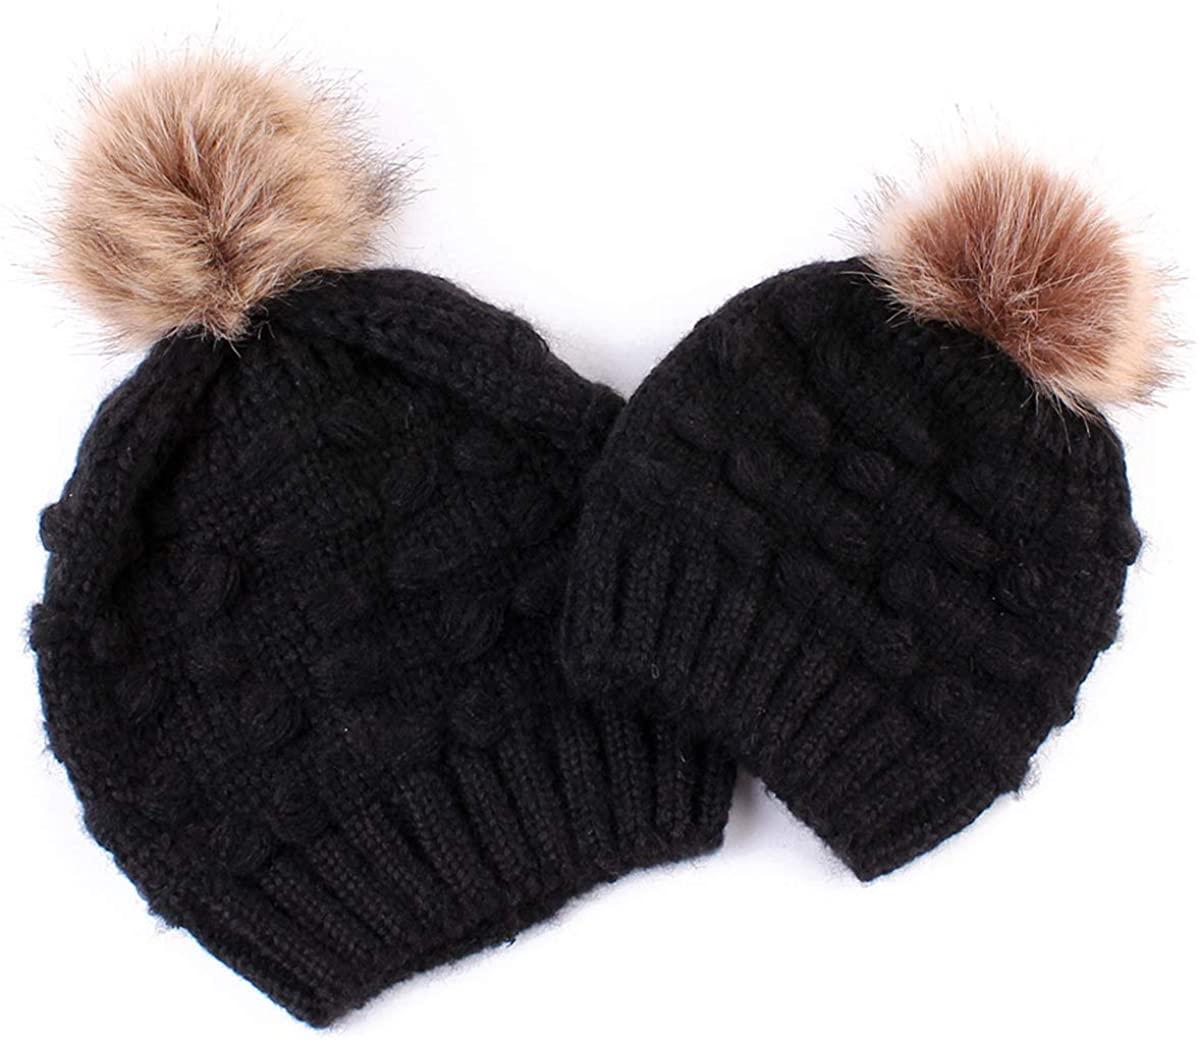 Rungion 2PCS Parent-Child Winter Hat Warmer Baby Women Hats Mother Baby Knit Hat Beanie Winter Warm Crochet Cap